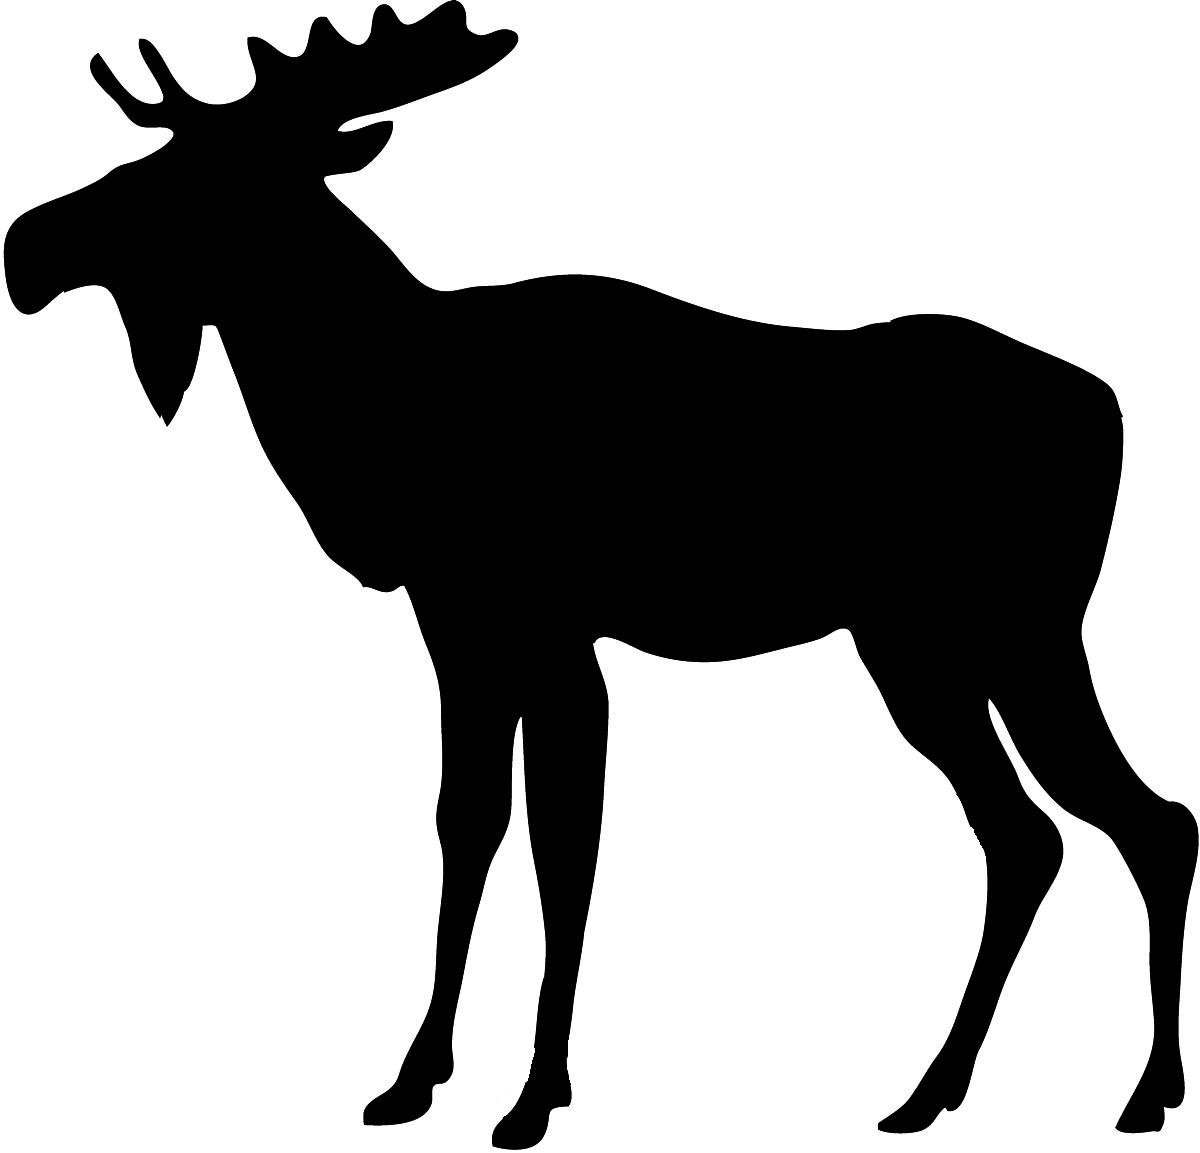 Moose clipart #4, Download drawings